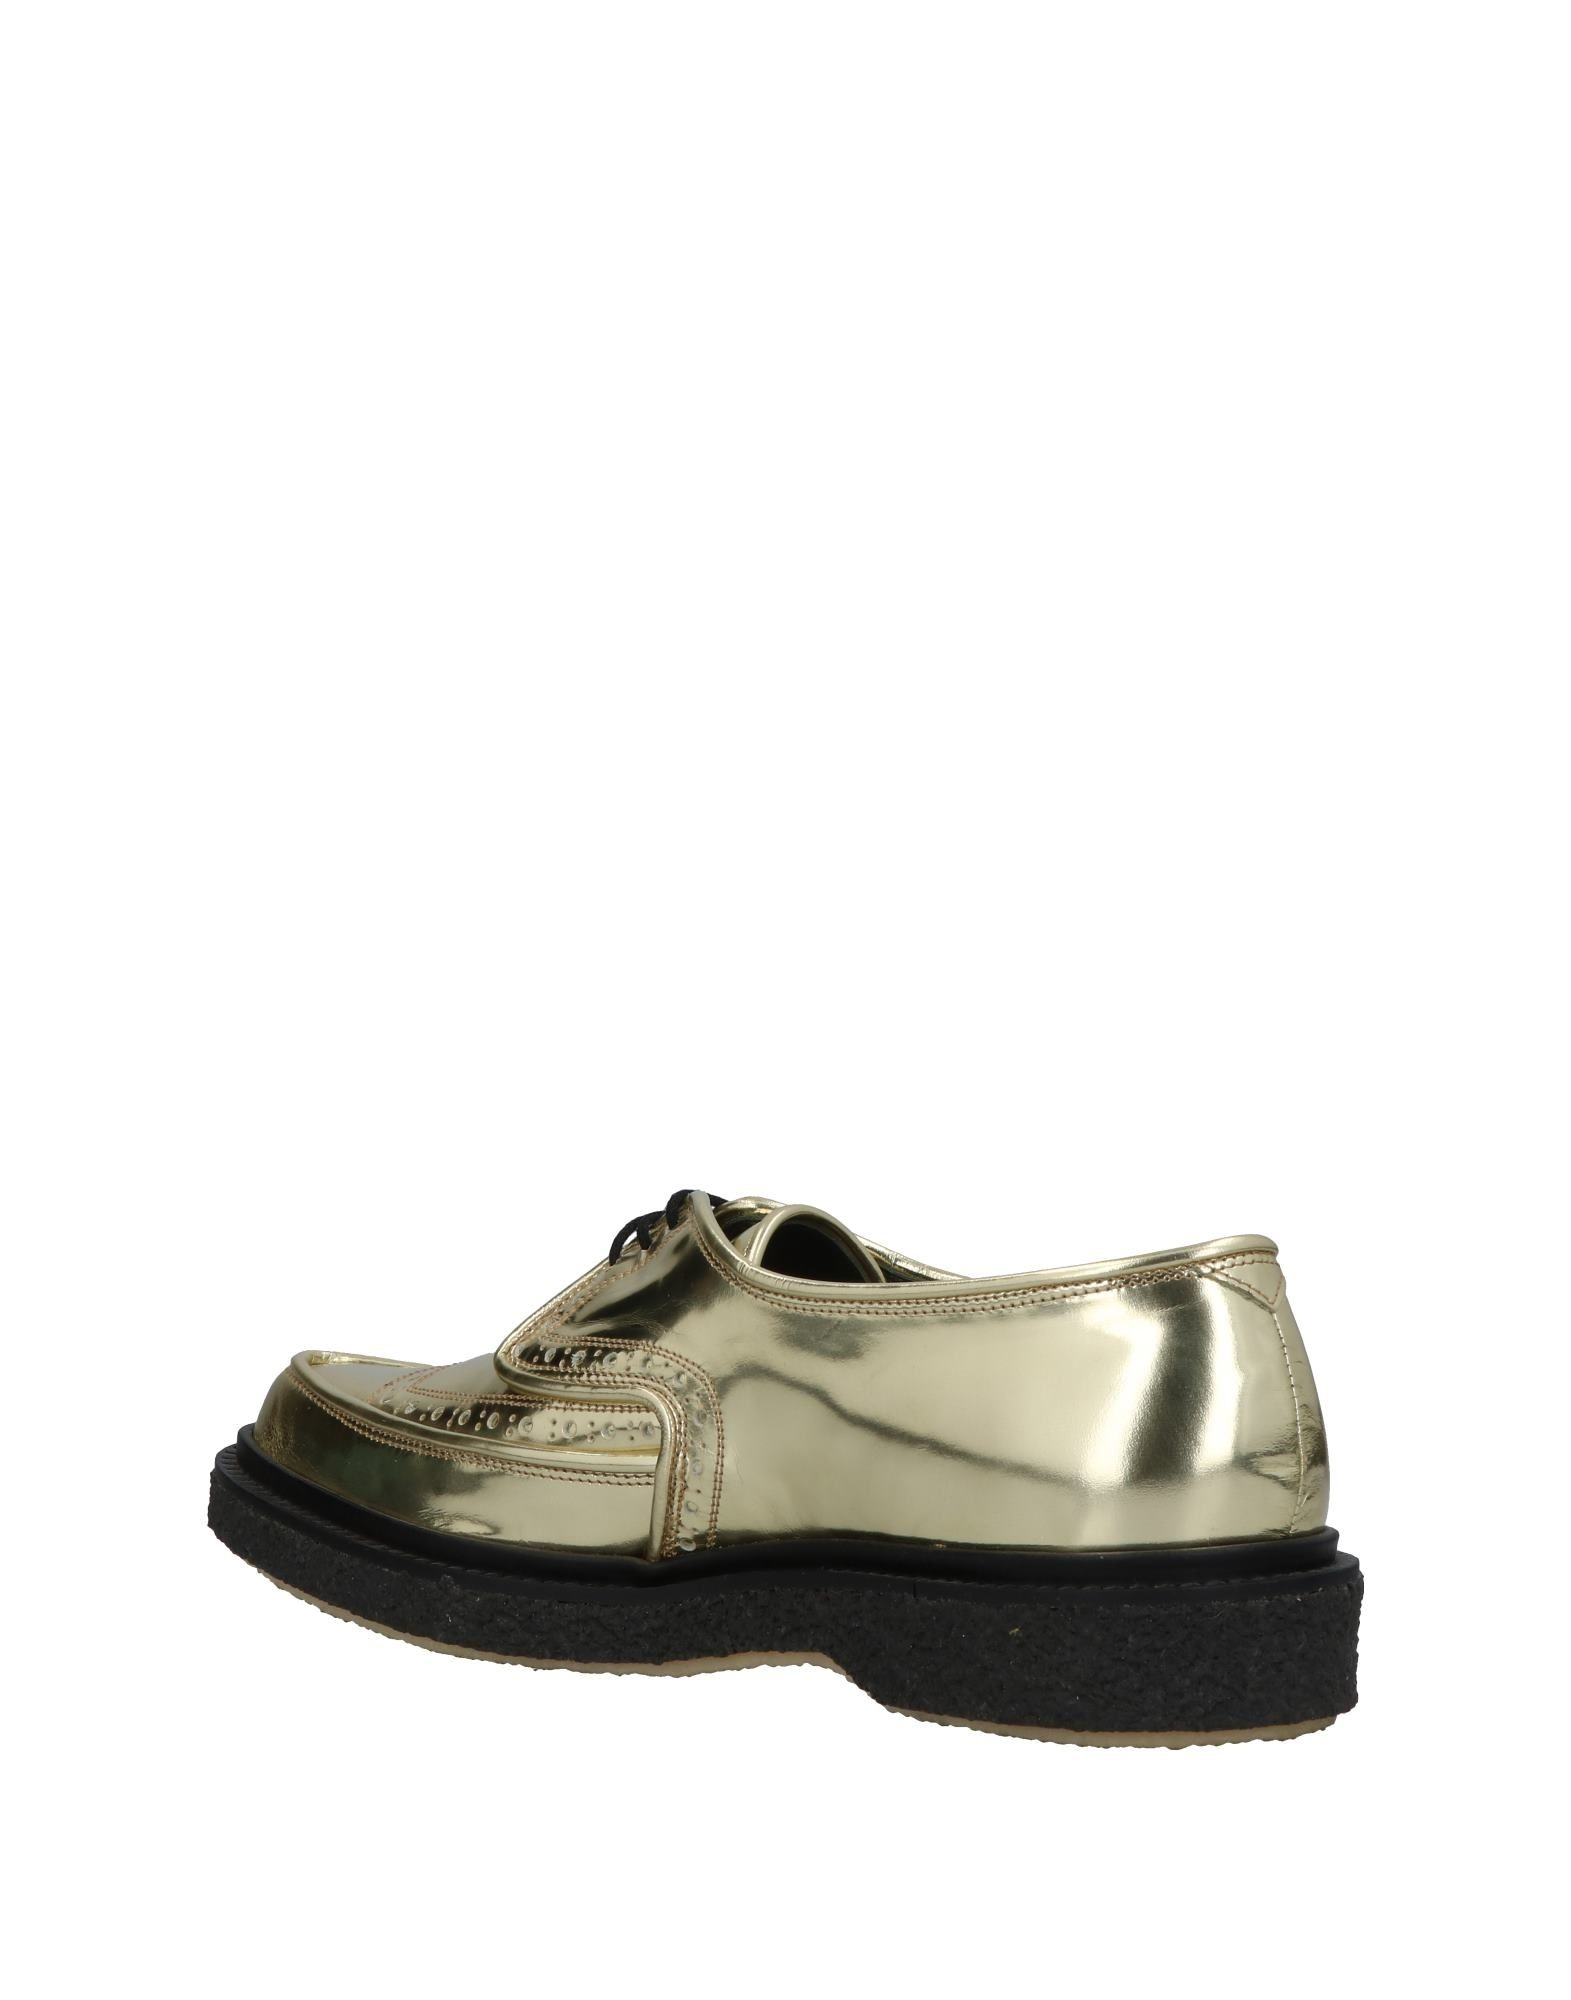 Adieu aussehende Schnürschuhe Damen  11390958LIGut aussehende Adieu strapazierfähige Schuhe 92ba4a